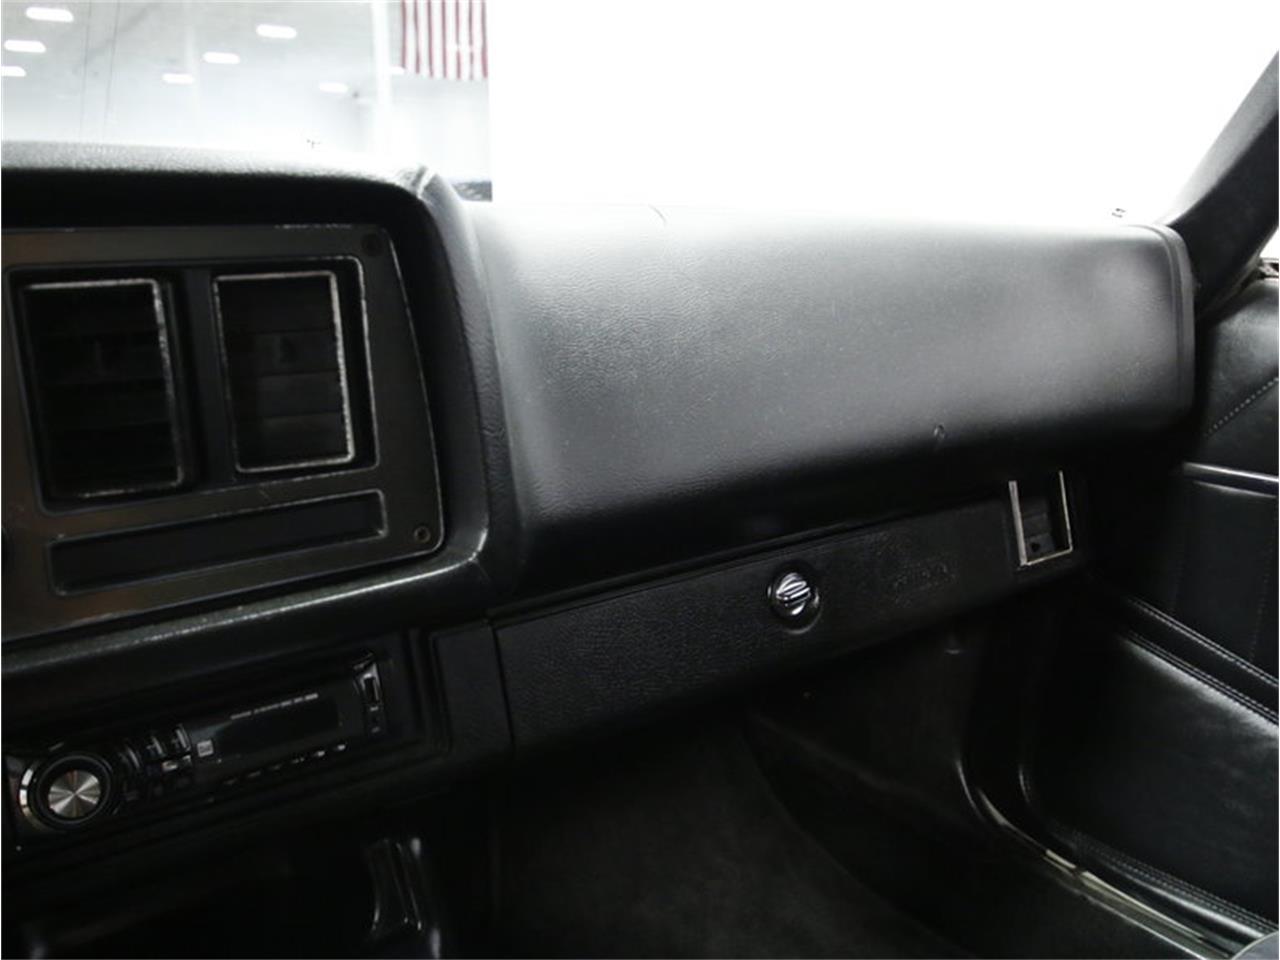 Large Picture of '78 Camaro Z28 located in Concord North Carolina - $16,995.00 - L5M0